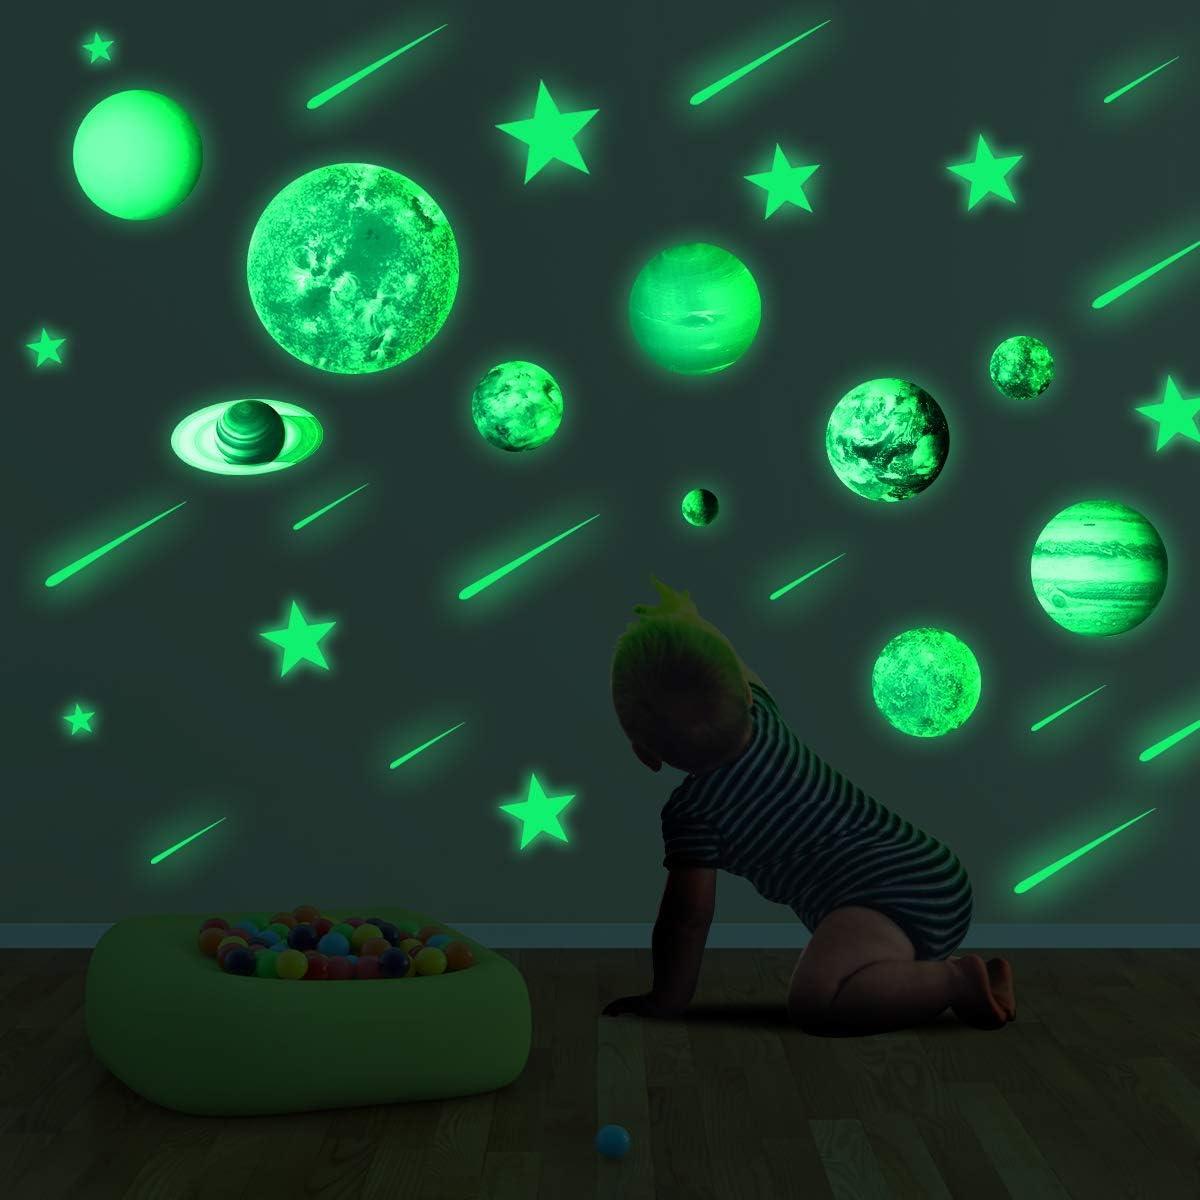 TV fondo Sala de Estar y Cocina 60x60cm 3D Ladrillo Pegatina Pared,DIY Autoadhesivo Etiqueta de Pared Decoraci/ón para Cuarto de Ba/ño 10